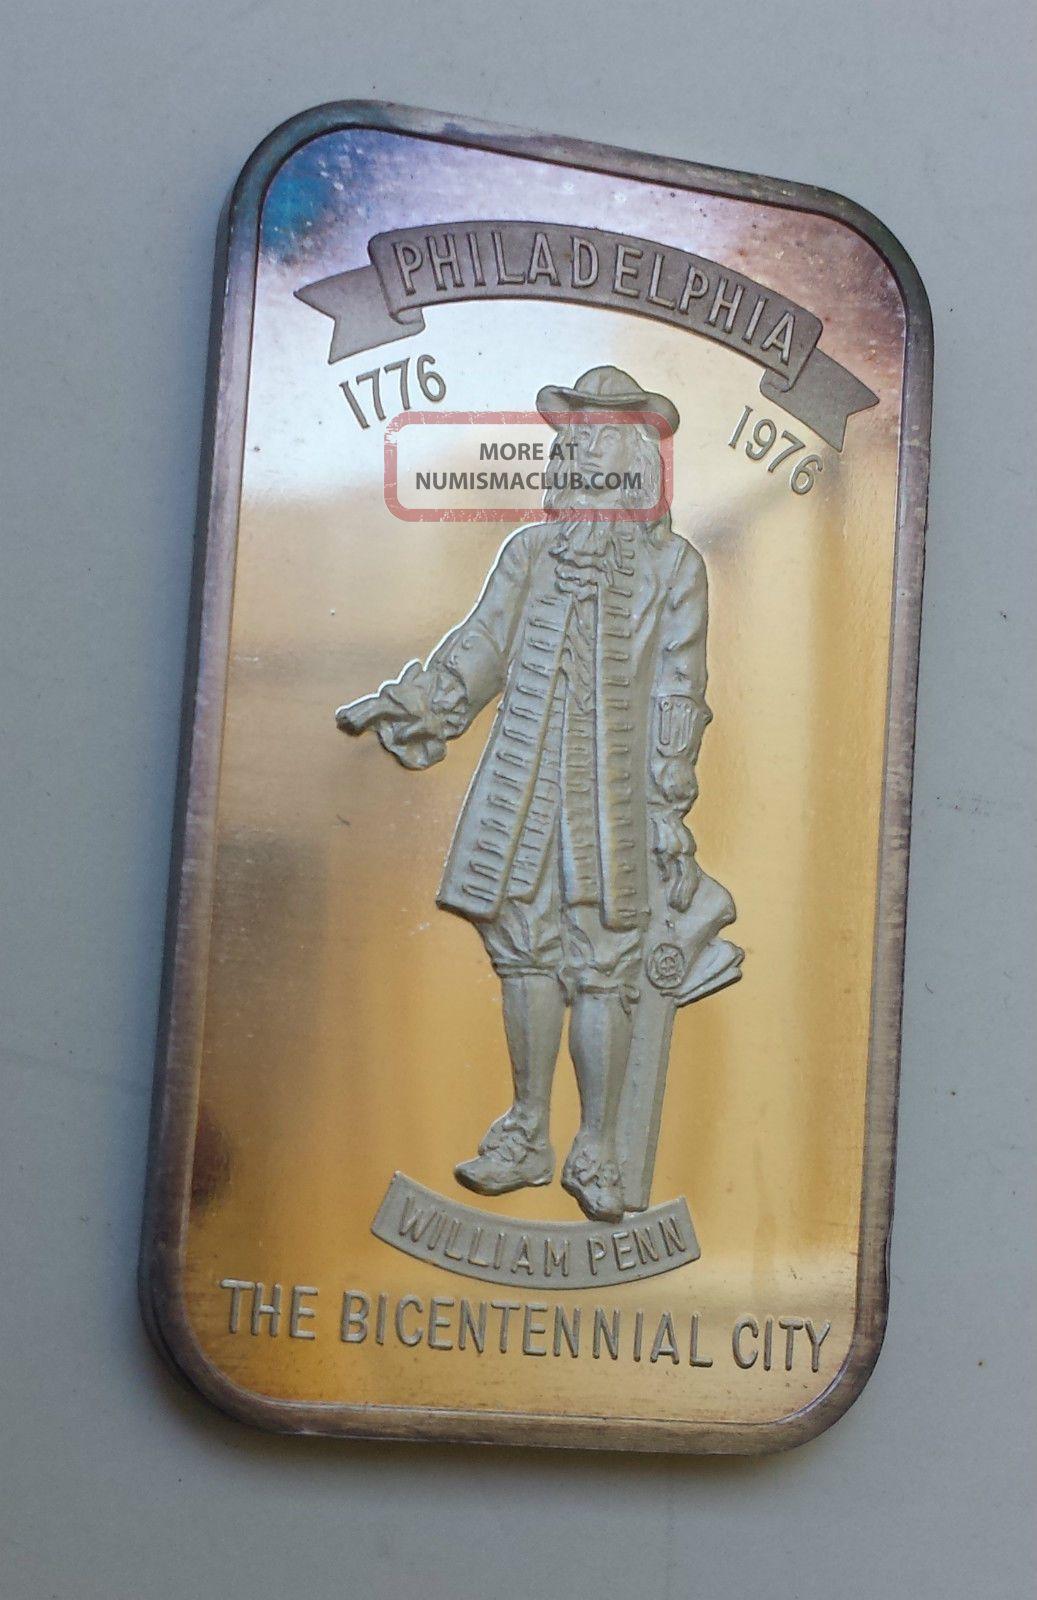 Silver Art Bar Philadelphia William Penn 1 Troy Ounce 999